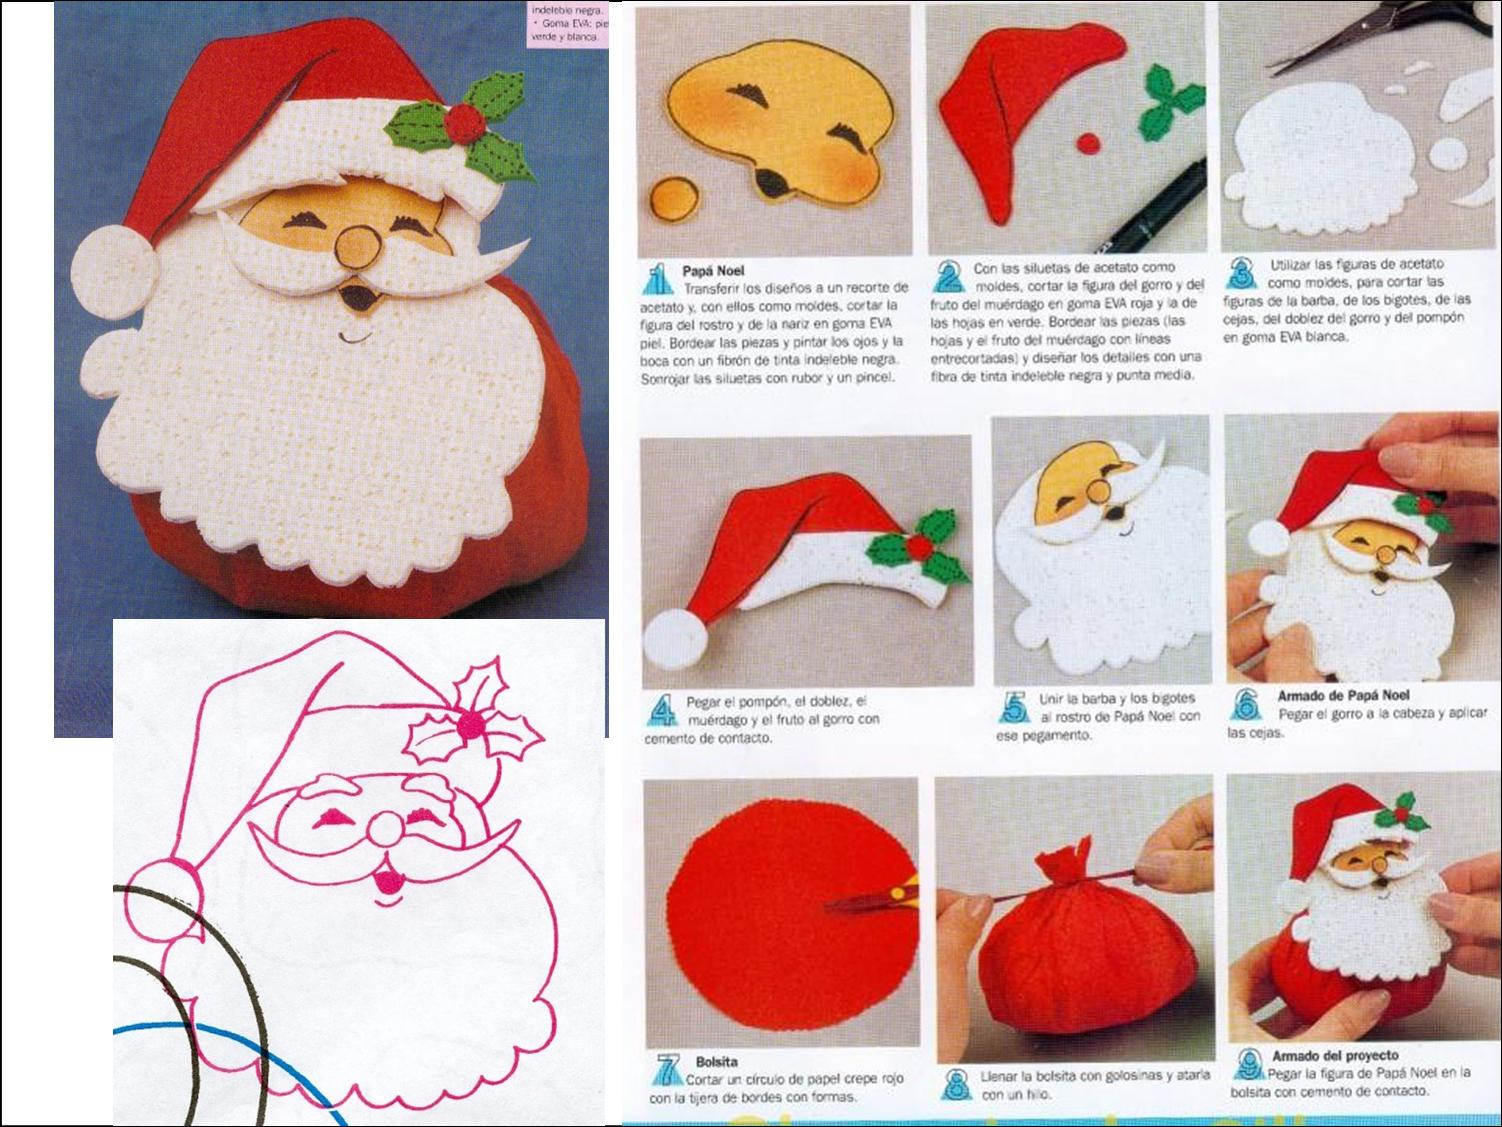 Saquinho De Jujuba   Papai Noel